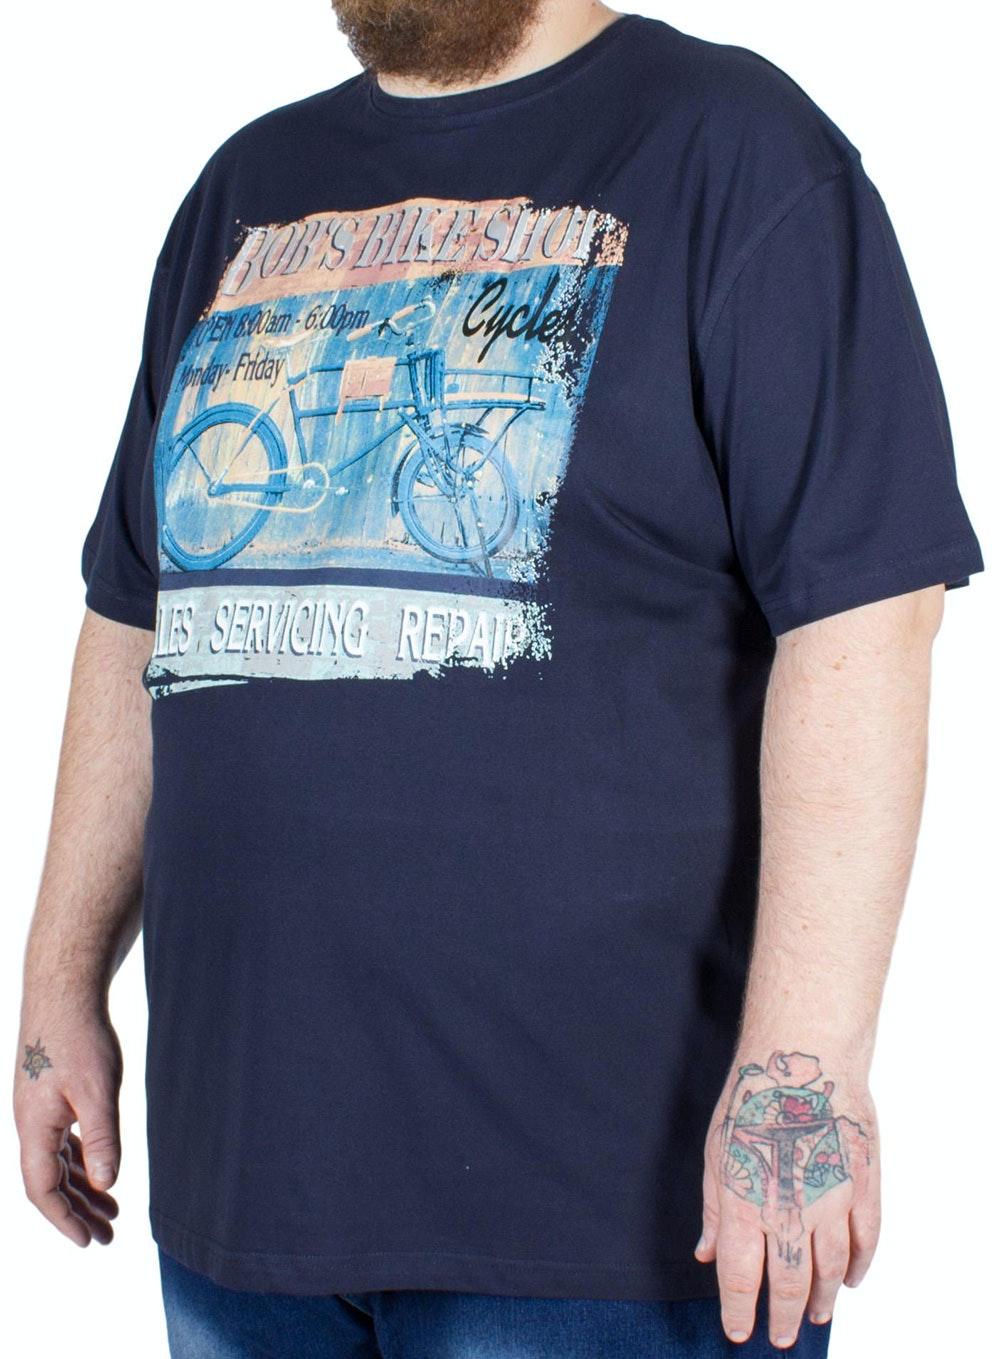 Metaphor Bob's Bike Print T-Shirt Navy